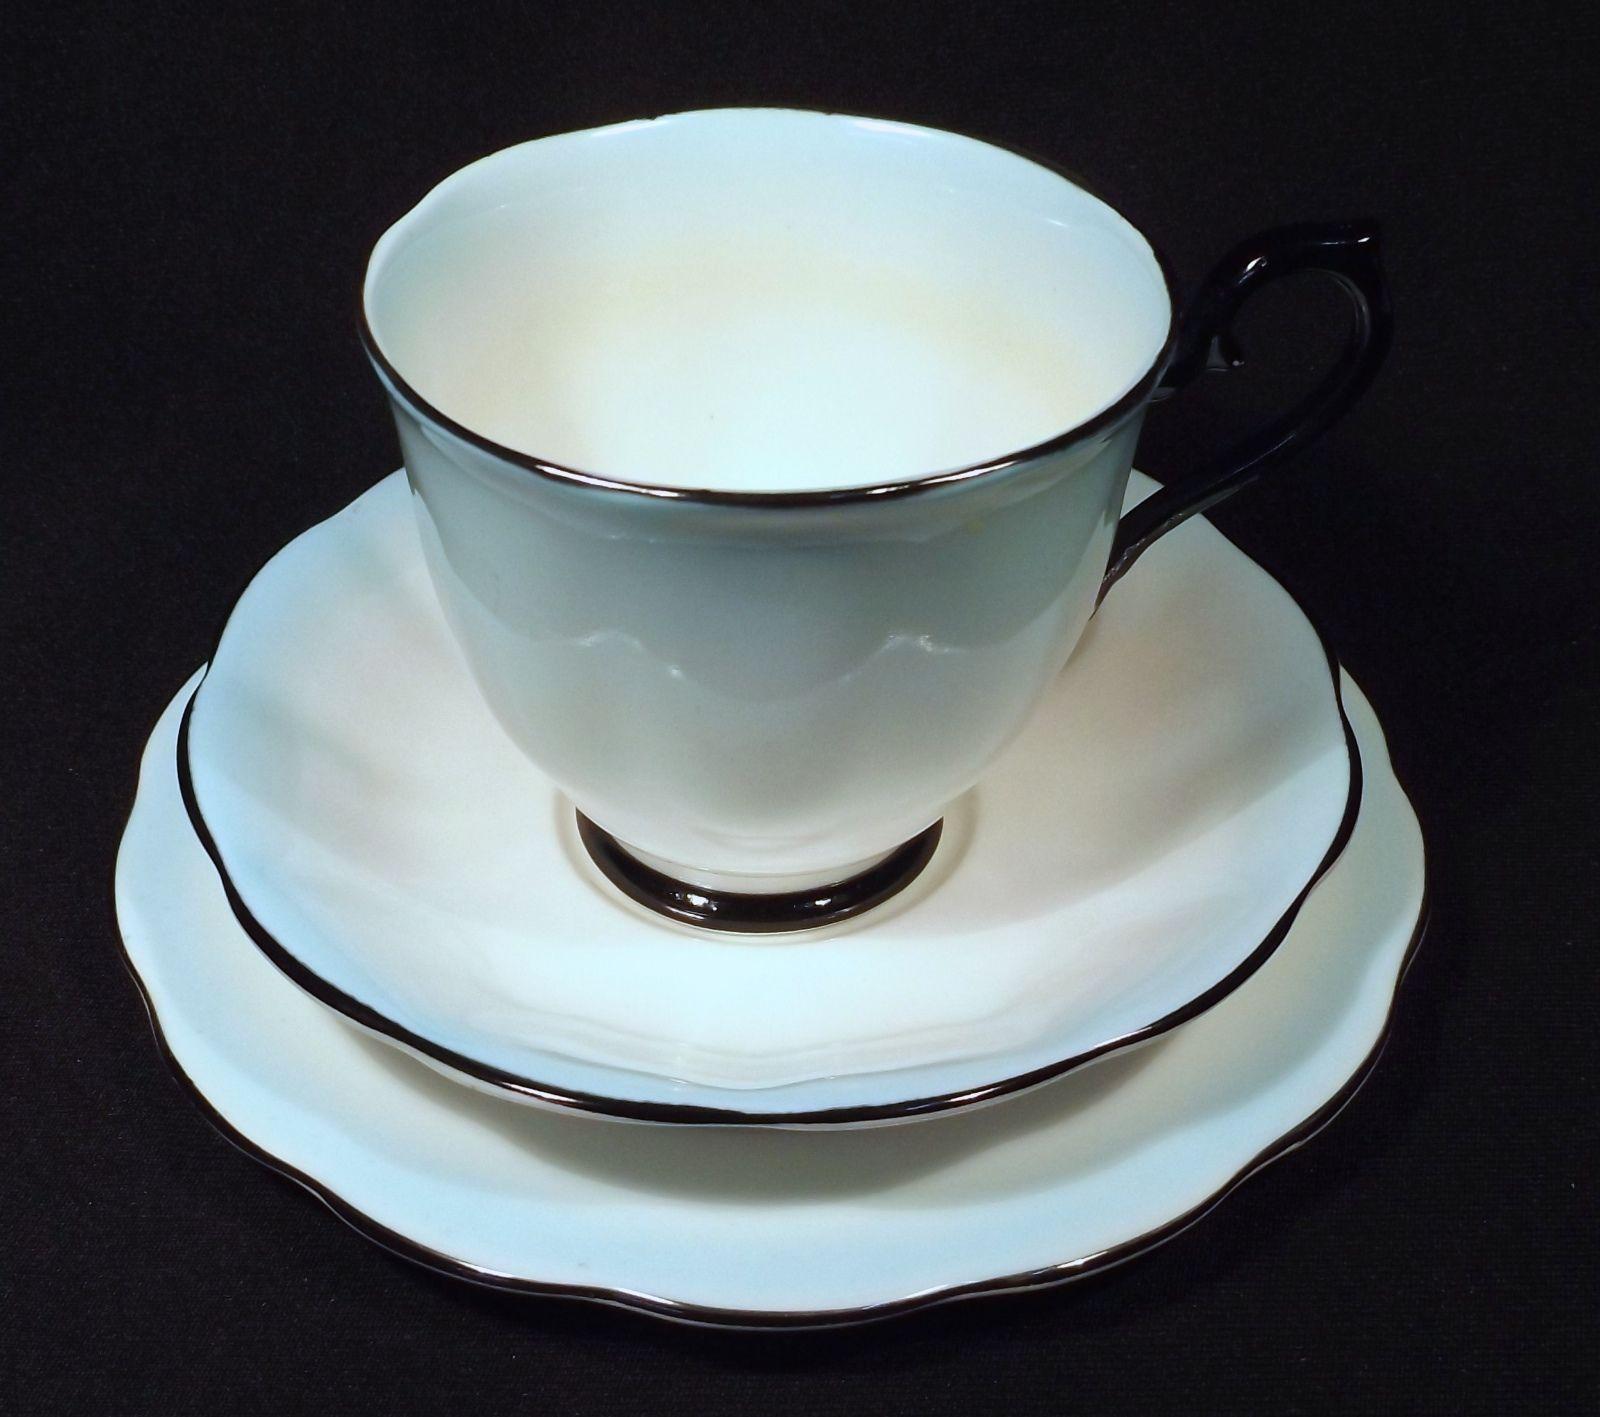 Royal albert bone china tea cup amp saucer winsome pattern ebay - 1950 S Royal Albert Bone China Trio Gradation Aqua To White With Contrasting Black Trim This